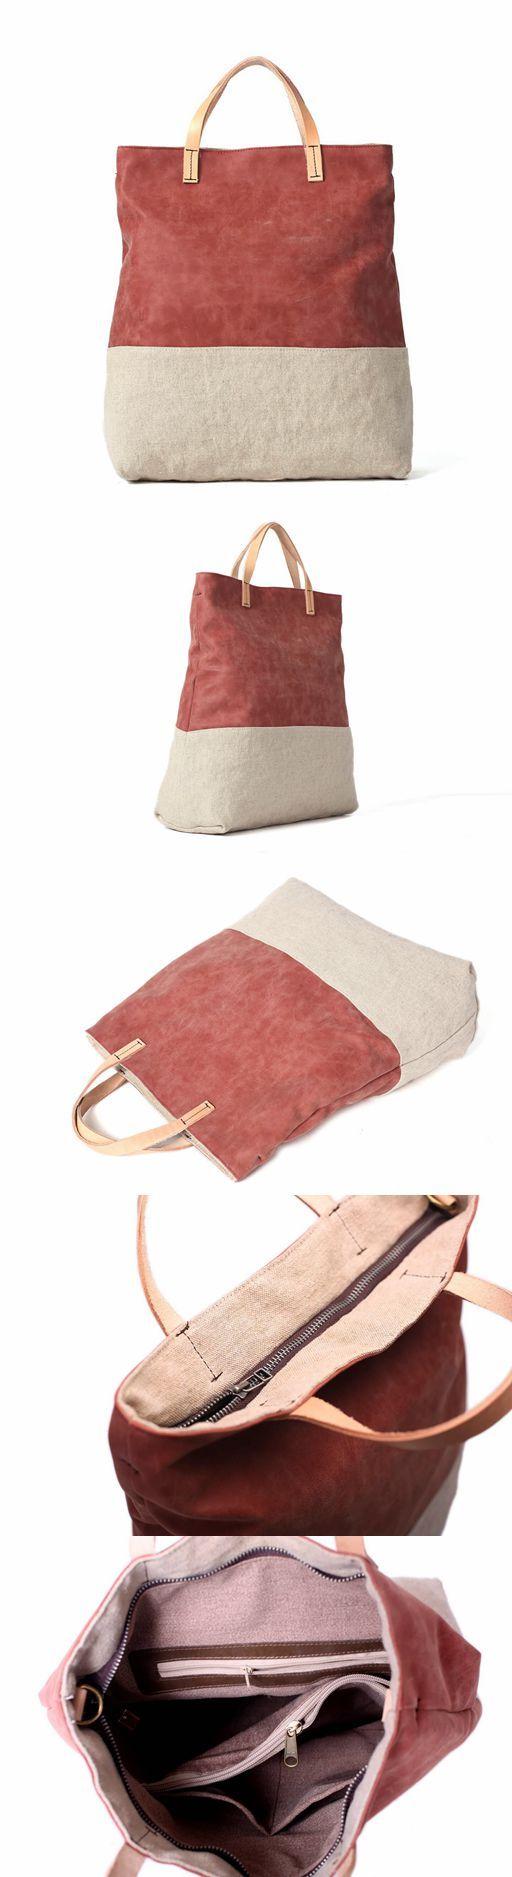 Canvas Tote Bag, Women's Shopping Bag, Daily Handbag, Messenger Bag YY01